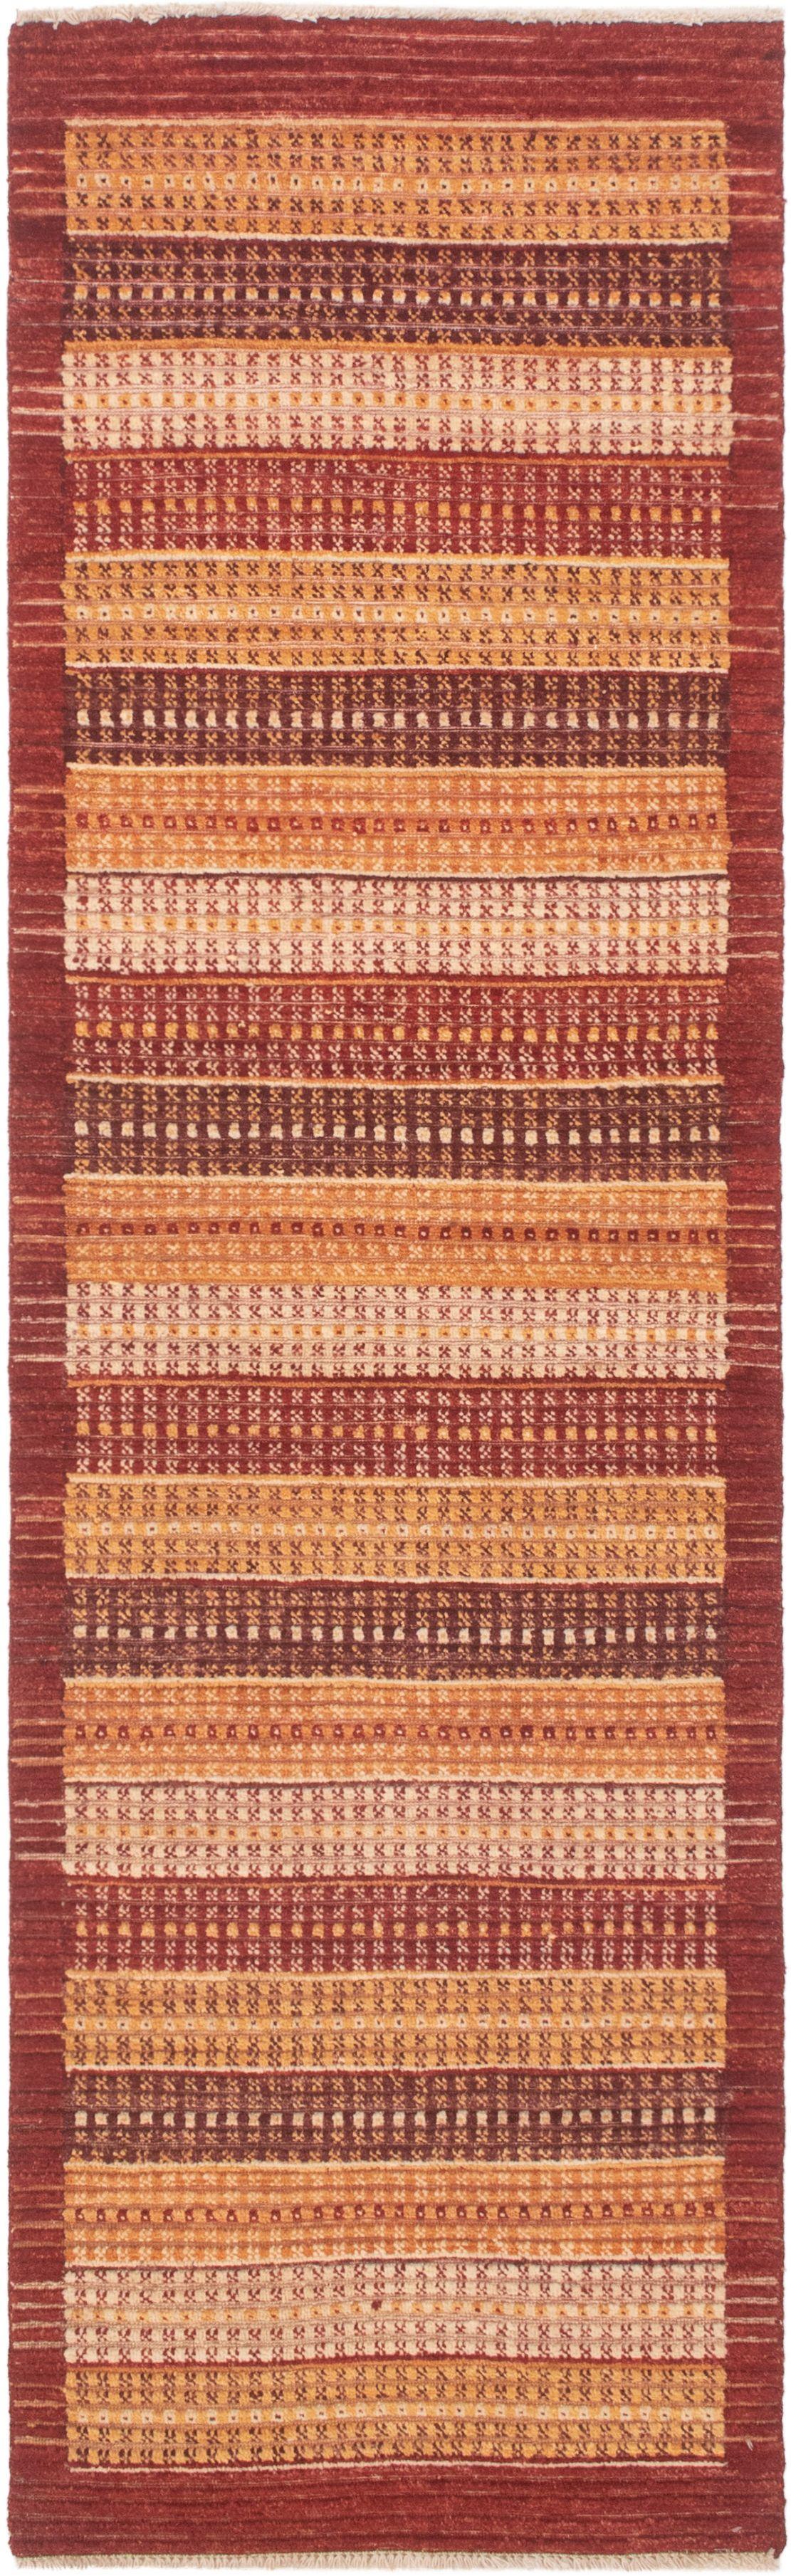 "Hand-knotted Finest Ziegler Chobi Dark Red Wool Rug 2'6"" x 8'8"" Size: 2'6"" x 8'8"""